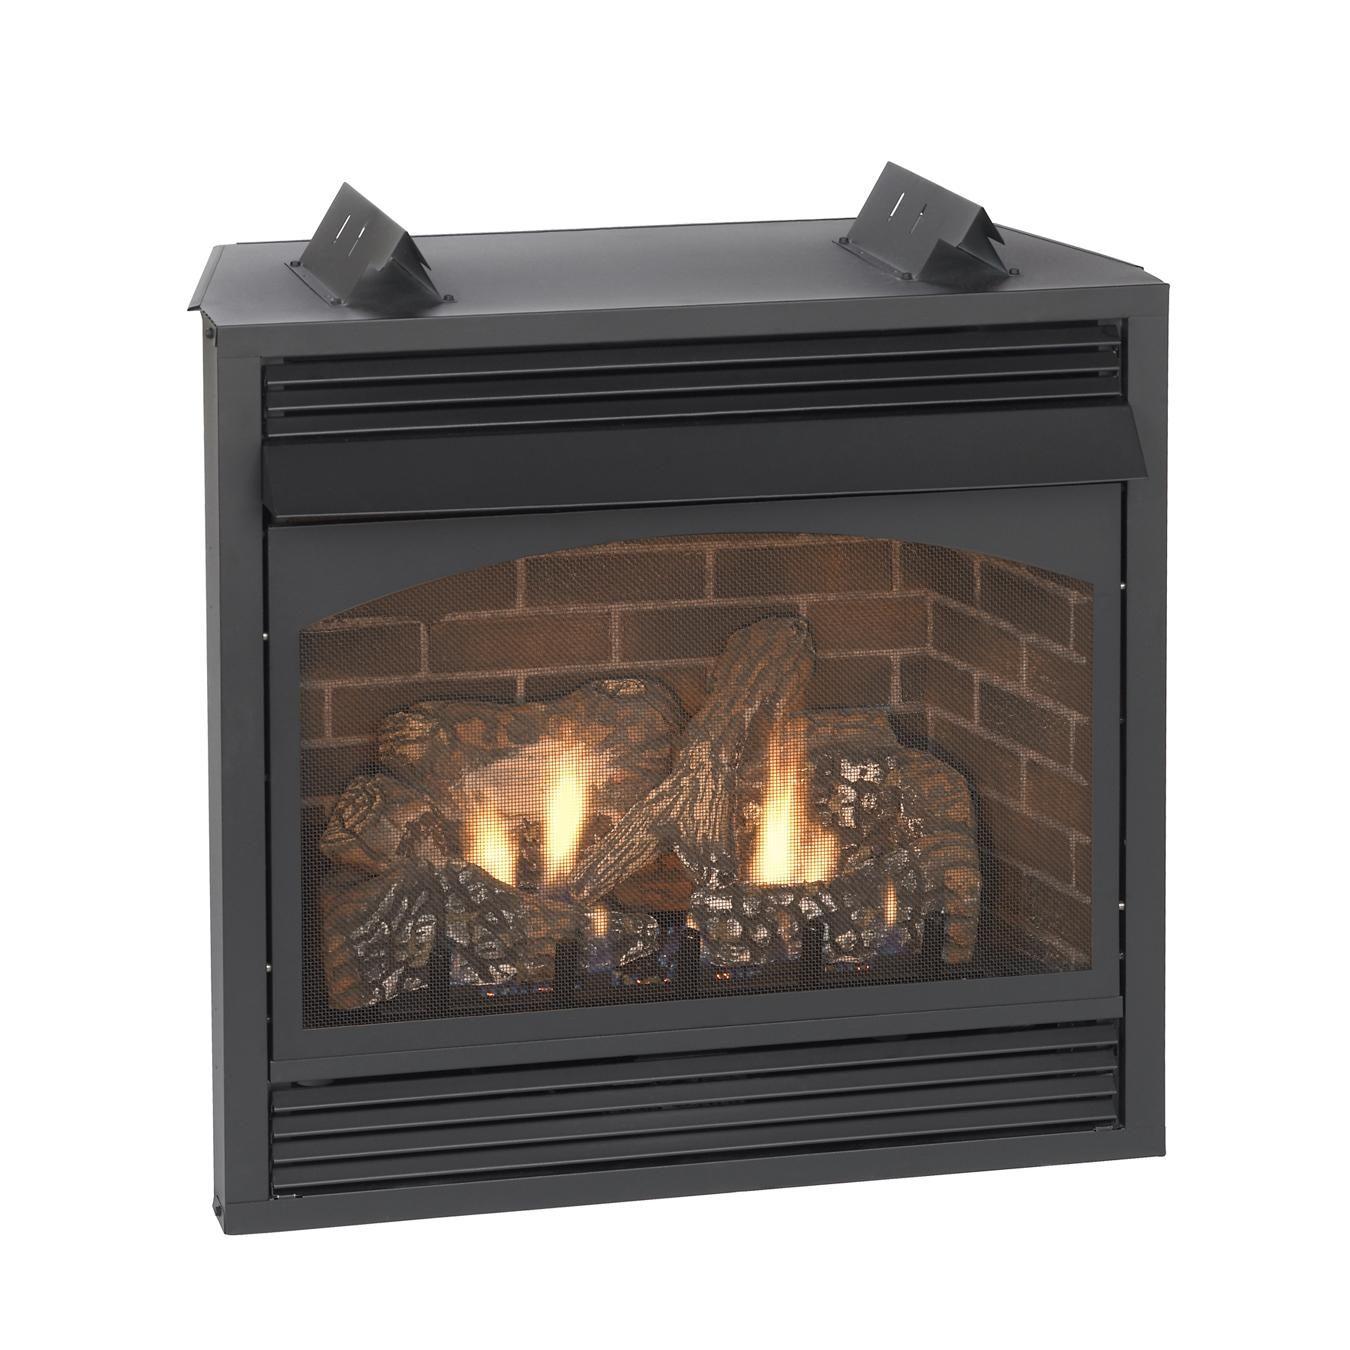 Empire Vail Premium Vent Free Natural Gas Fireplace With Blower 32 Propane Fireplace Gas Fireplace Natural Gas Fireplace